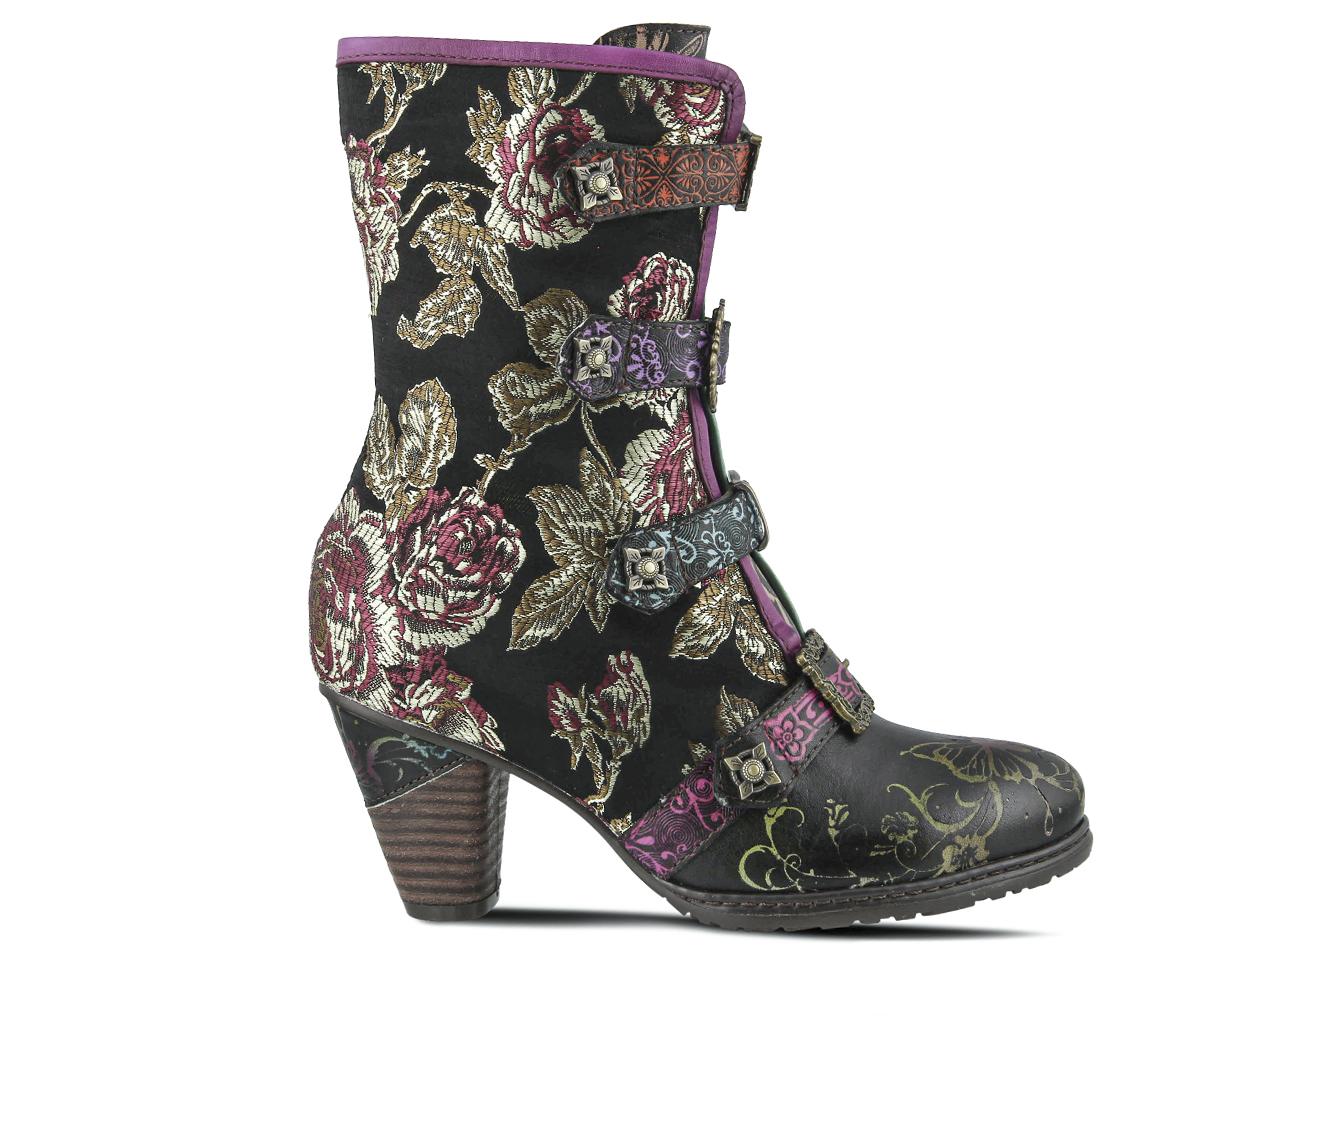 L'Artiste Chixxiela Women's Boots (Black Leather)